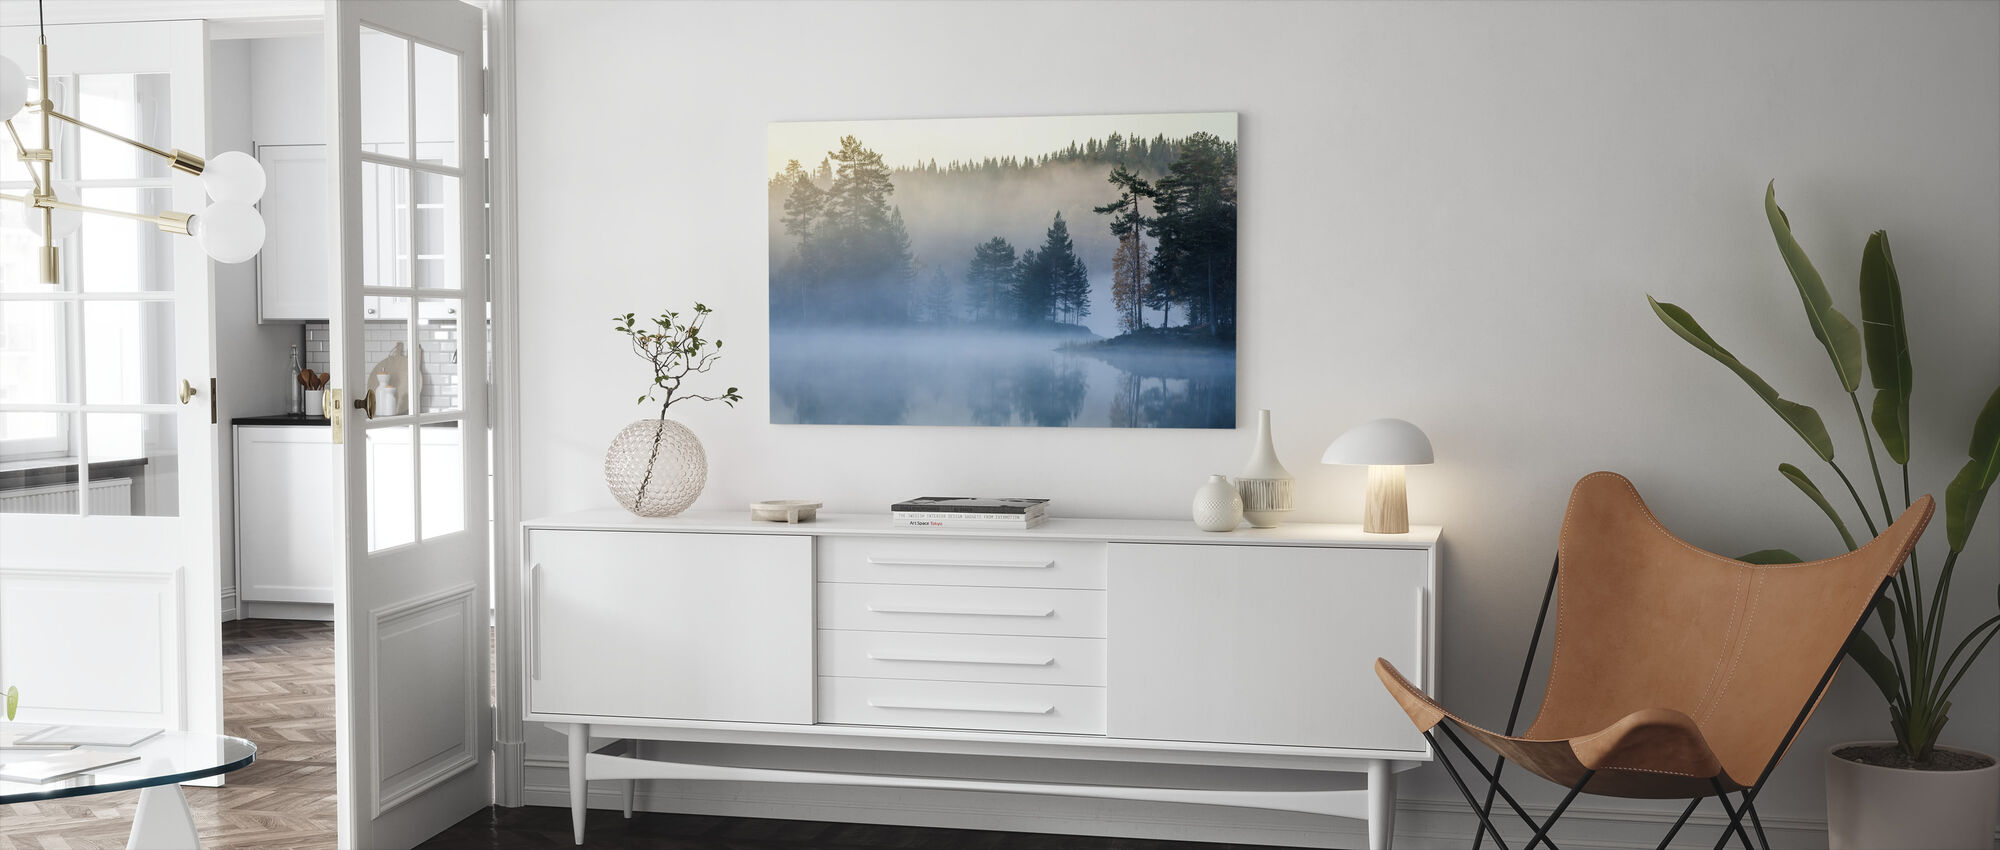 Noorse Mist - Canvas print - Woonkamer